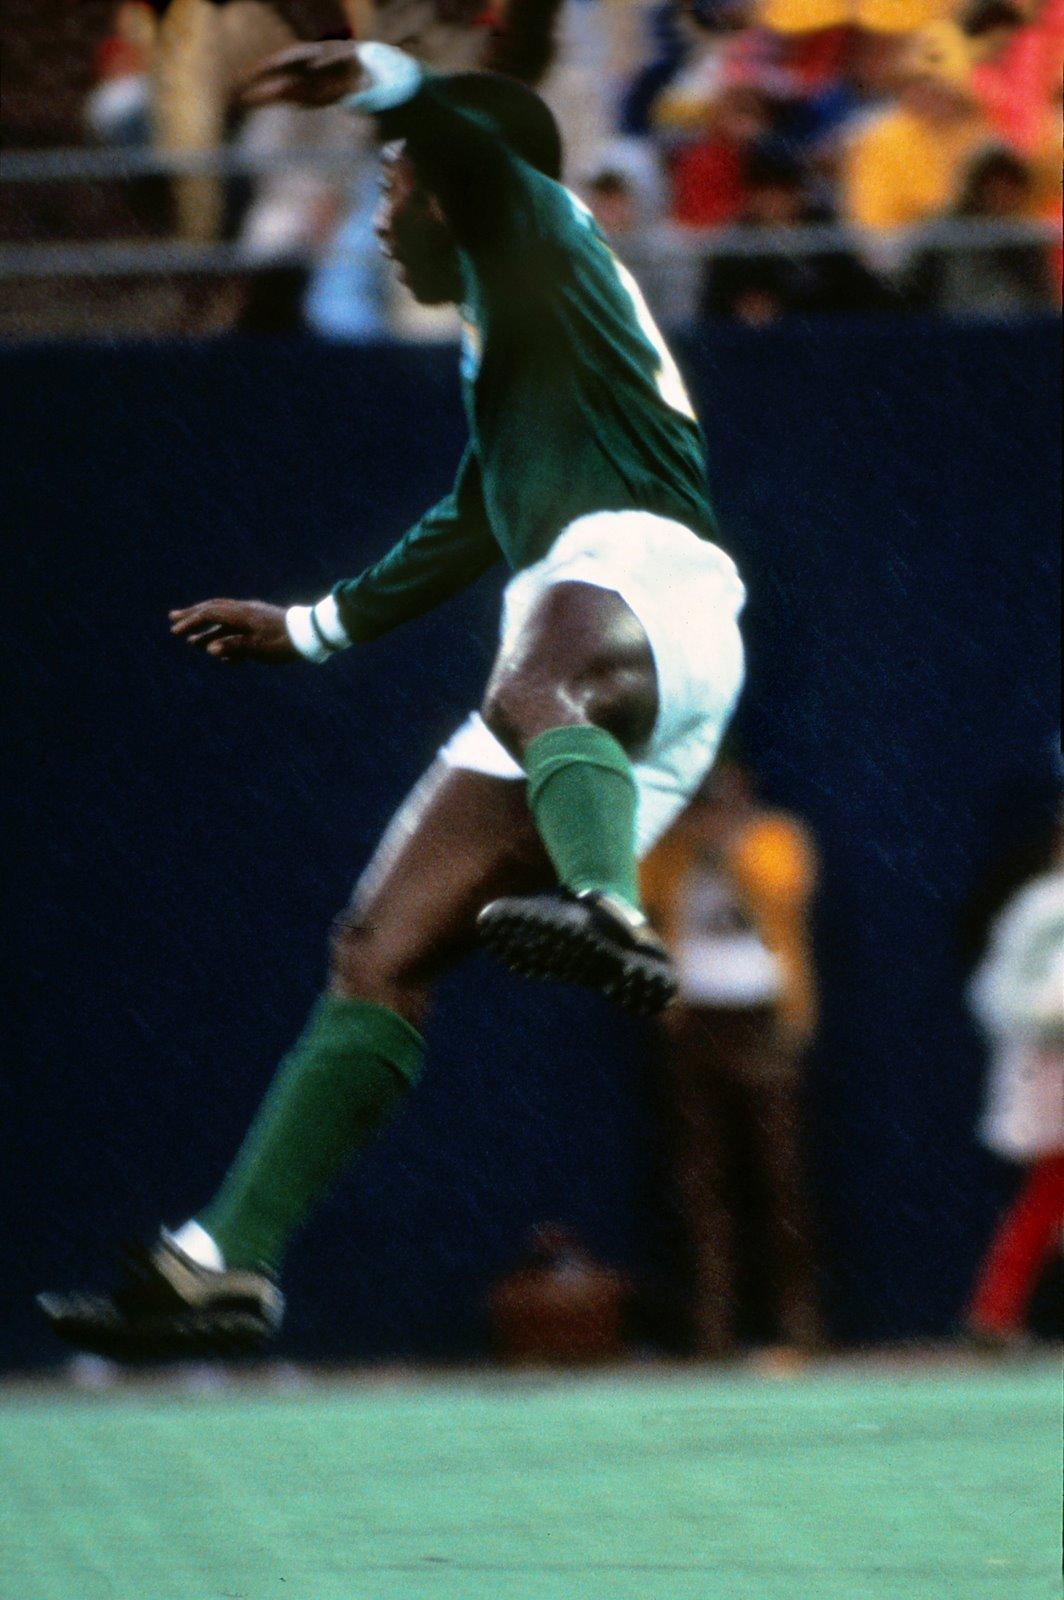 pele_last_ever_goal_1977.jpg